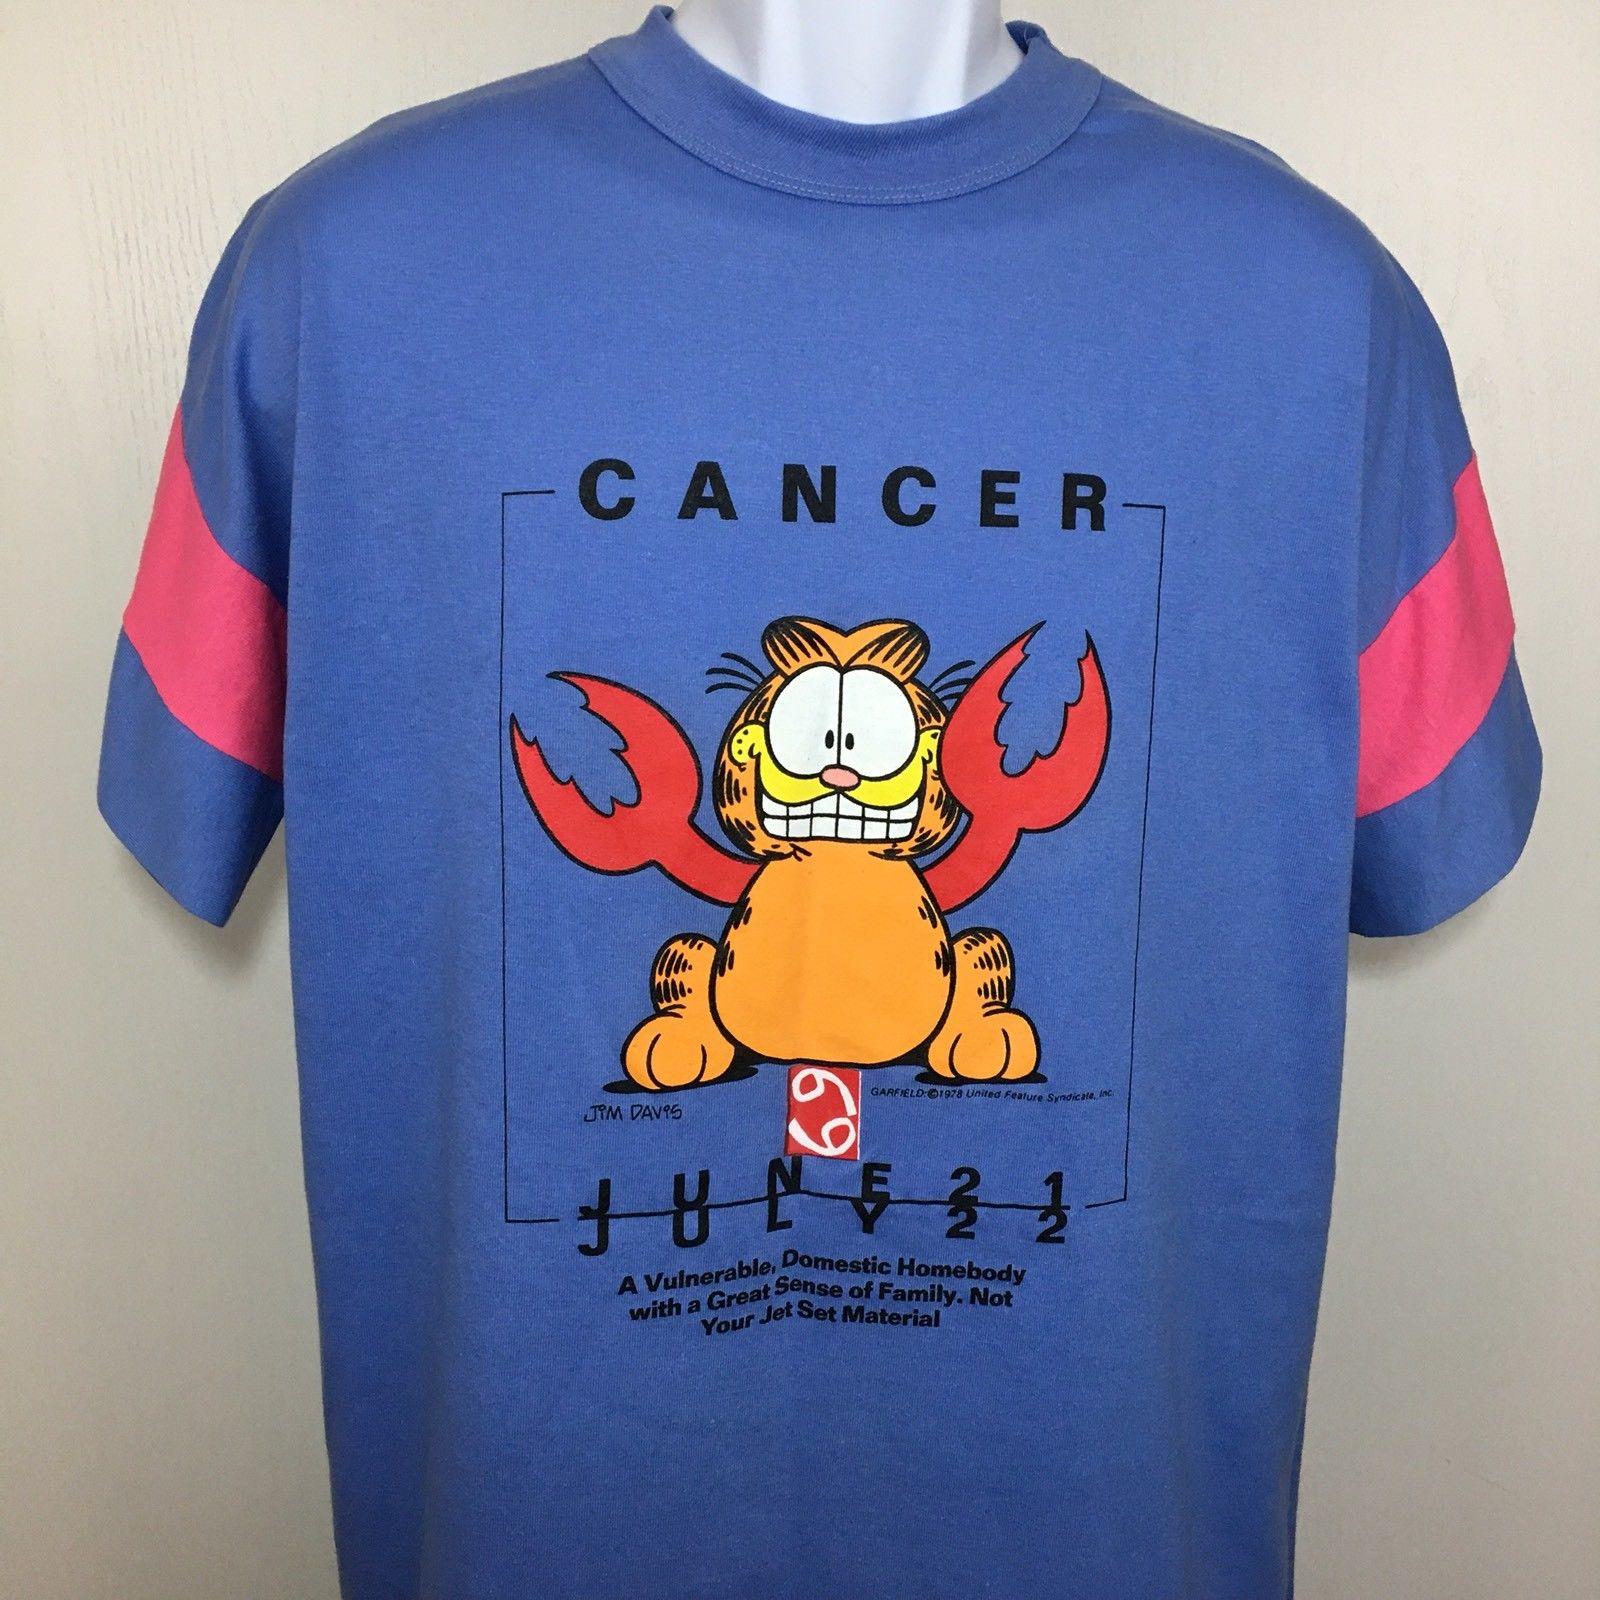 Vintage Garfield T Shirt Vintage 70s Long Adult Tee Single Stitch Sleep Mens Womens Flirts Gift Idea Grailed